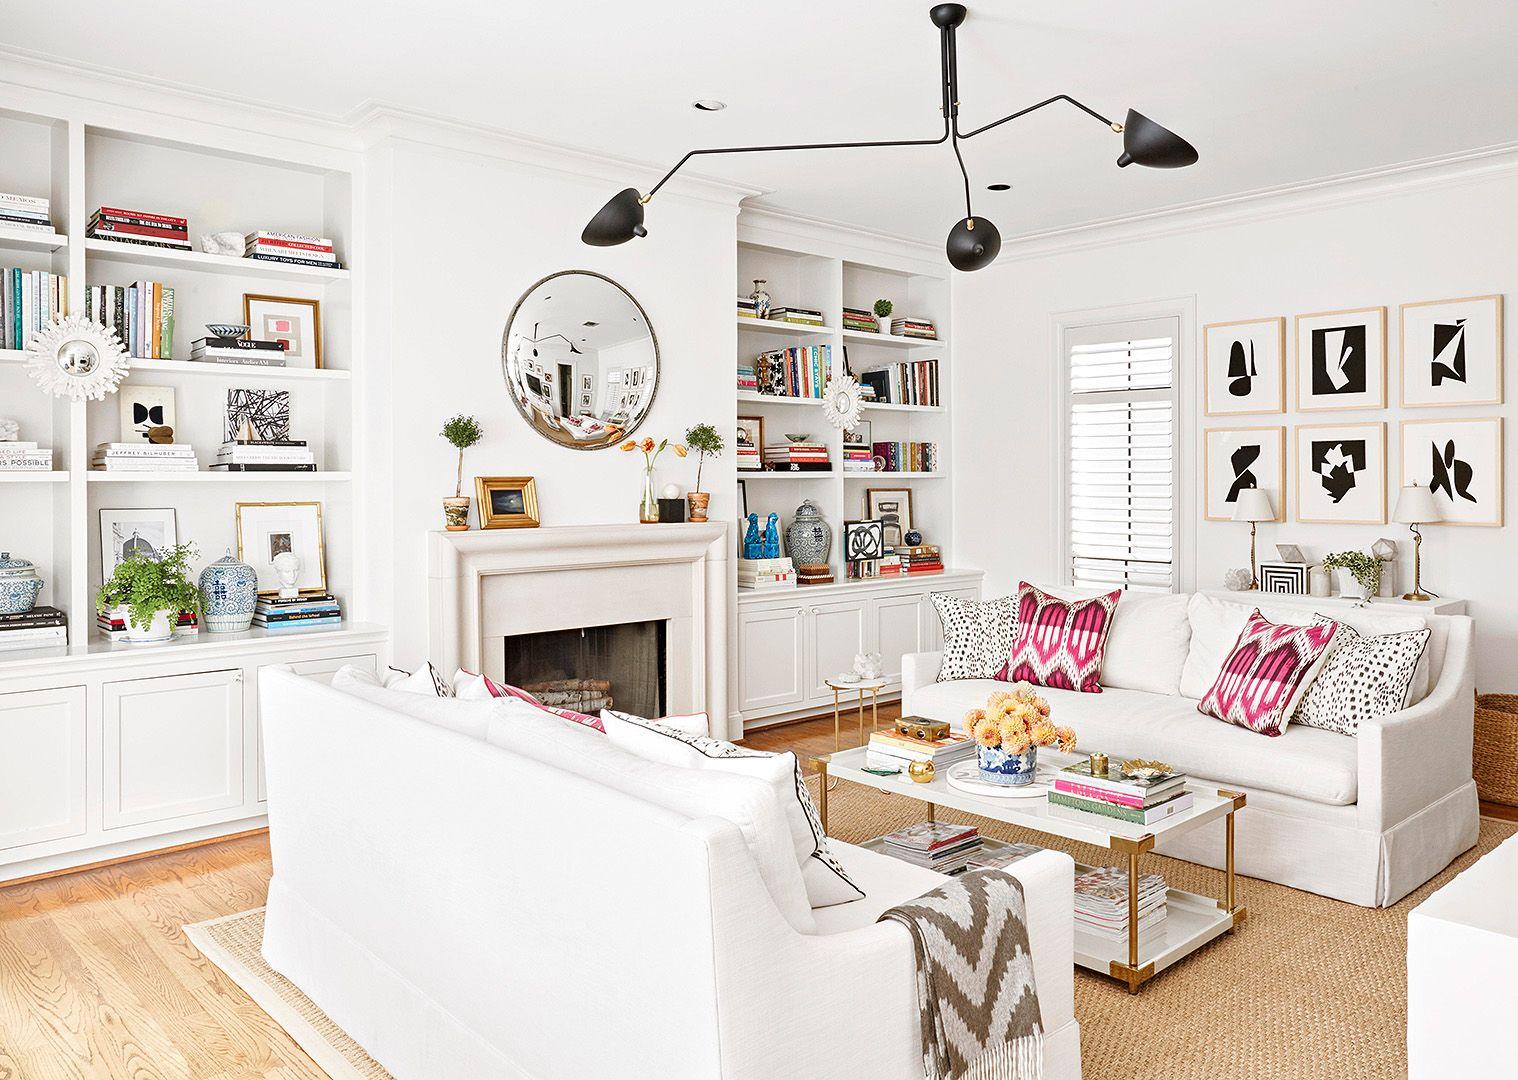 9 Decorating Ideas That Make White Walls Anything But Boring